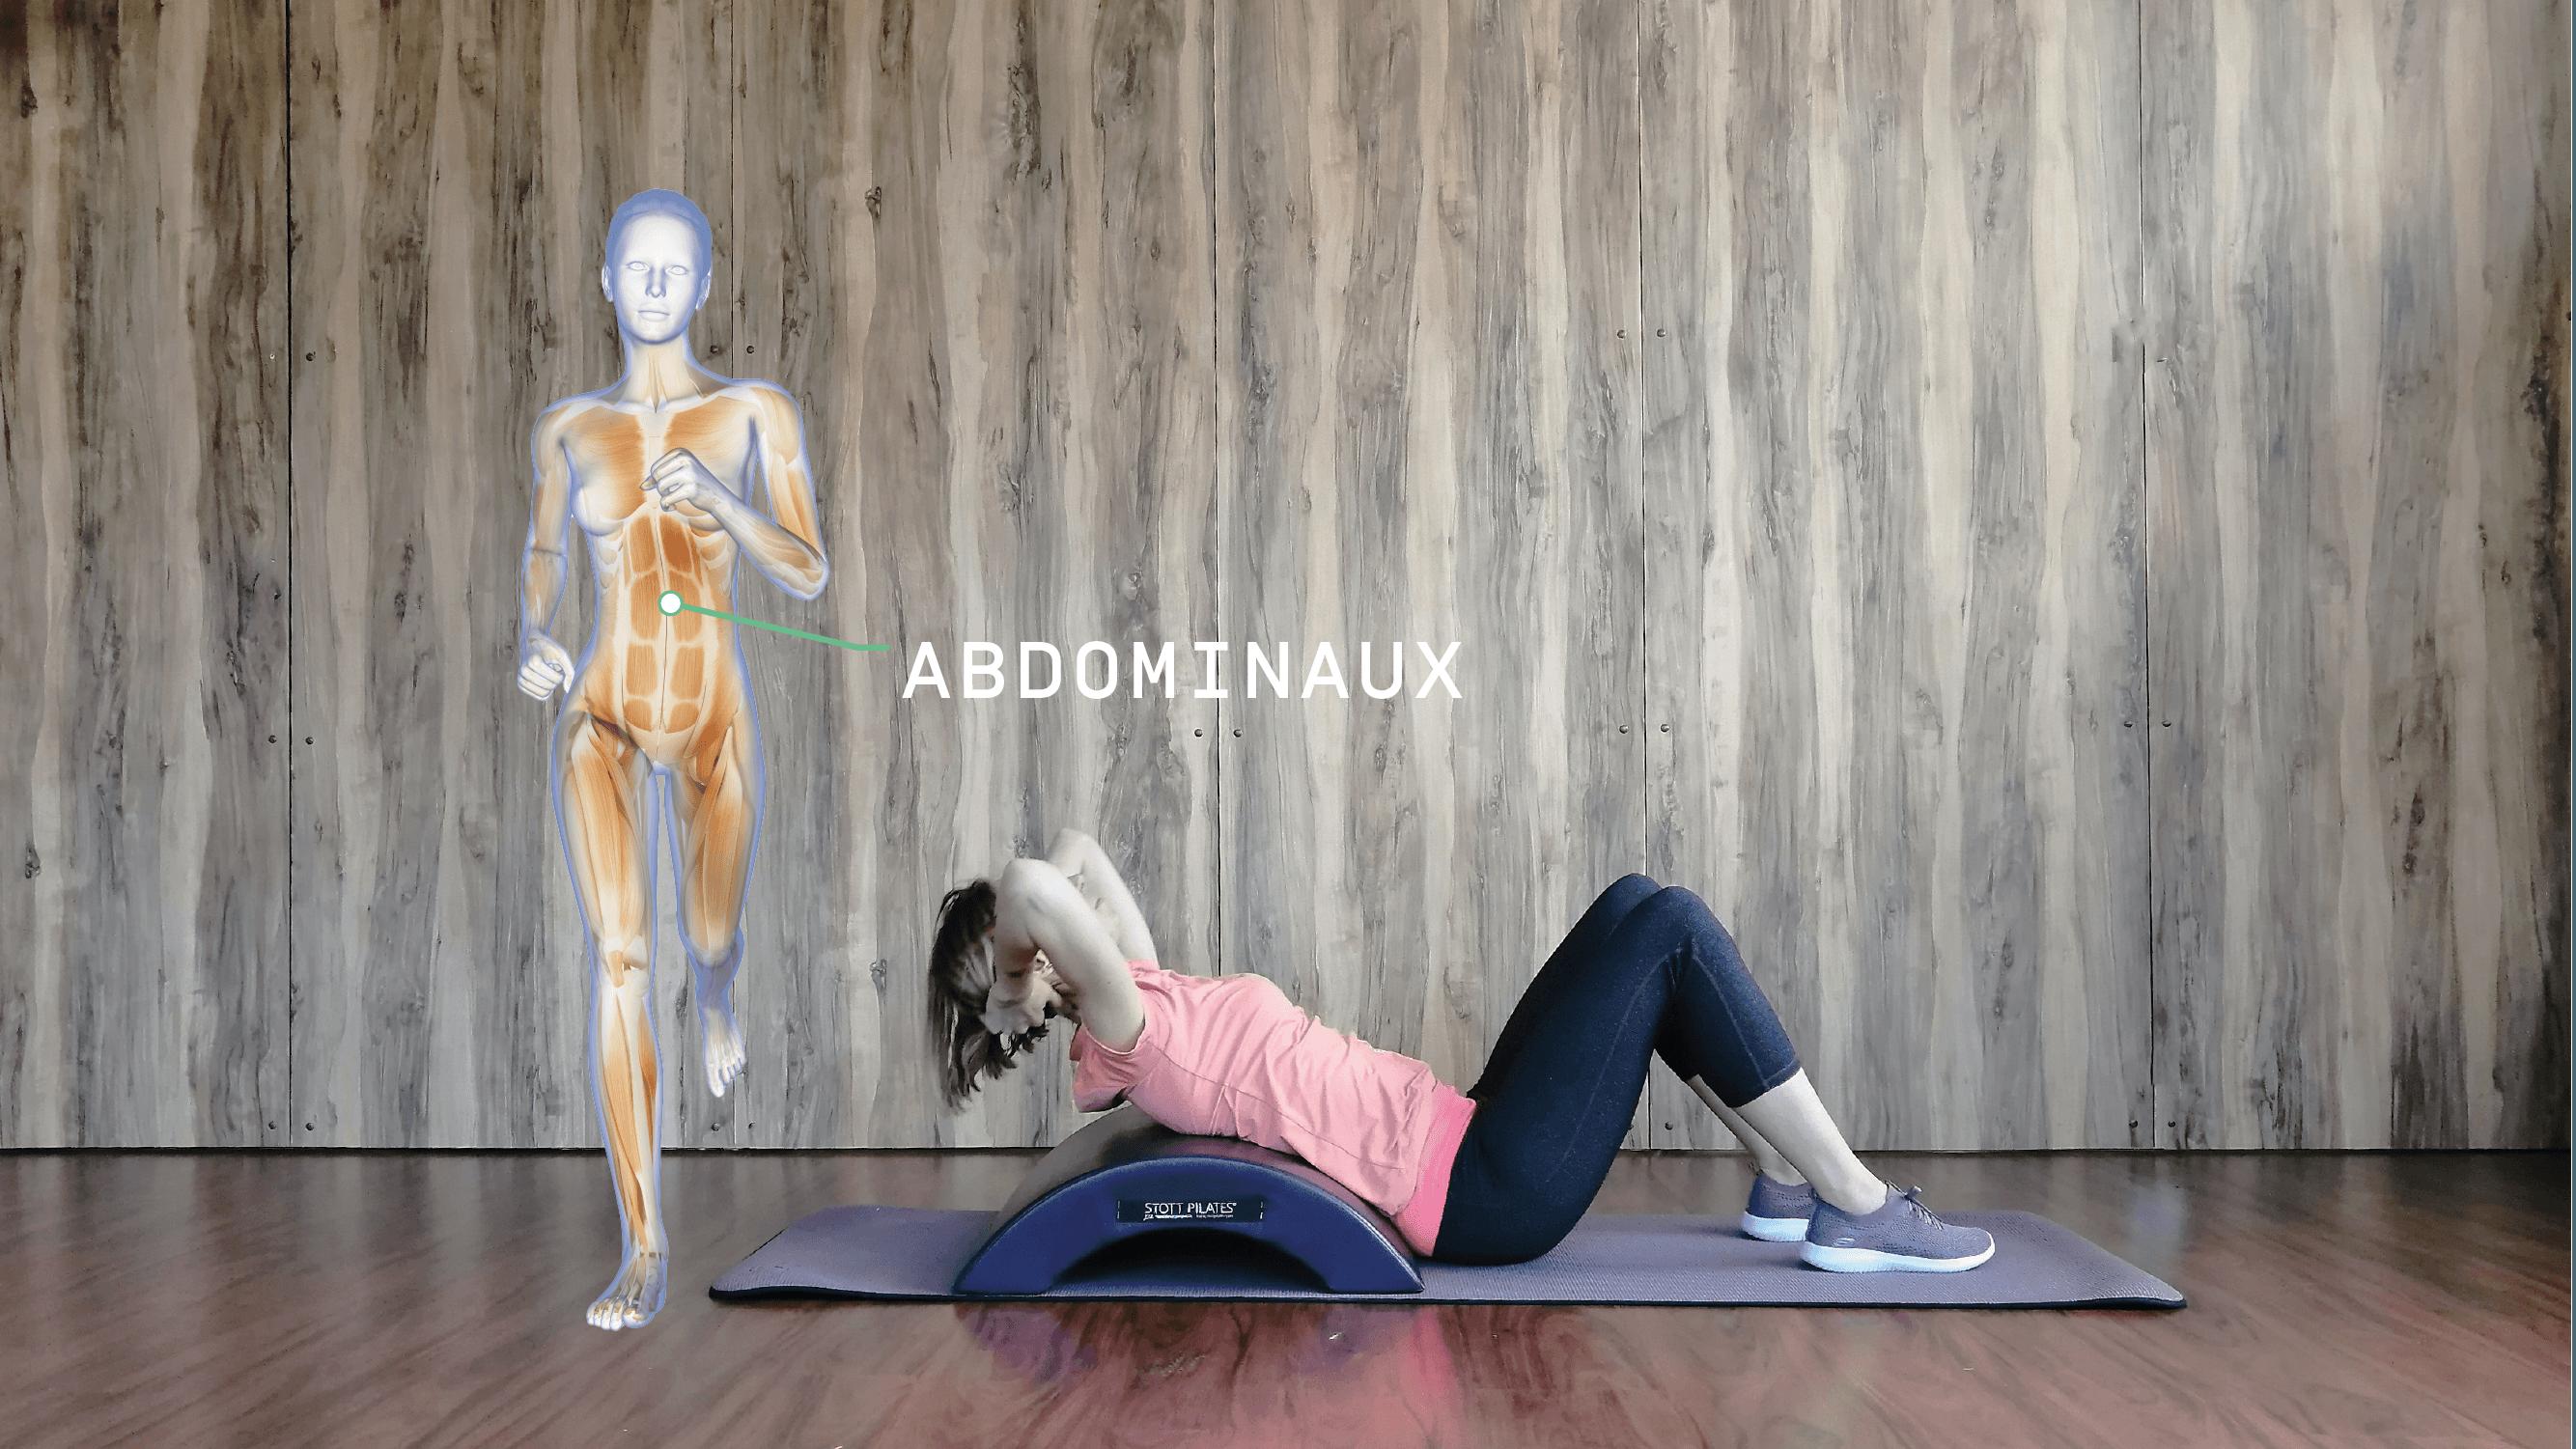 Anatomie Enmouvement - Abdominaux